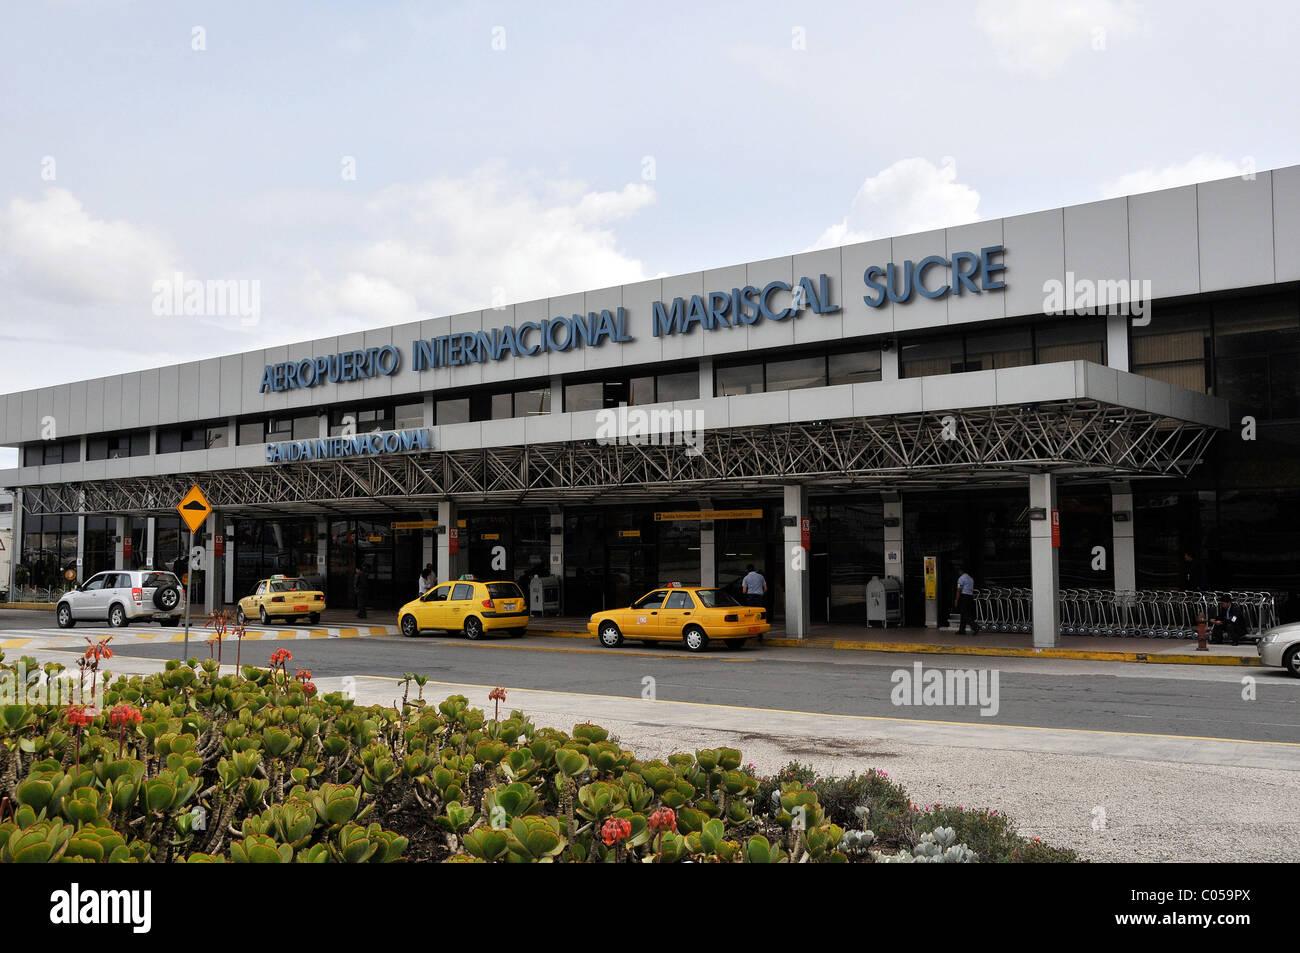 Quito Airport Stock Photos & Quito Airport Stock Images - Alamy